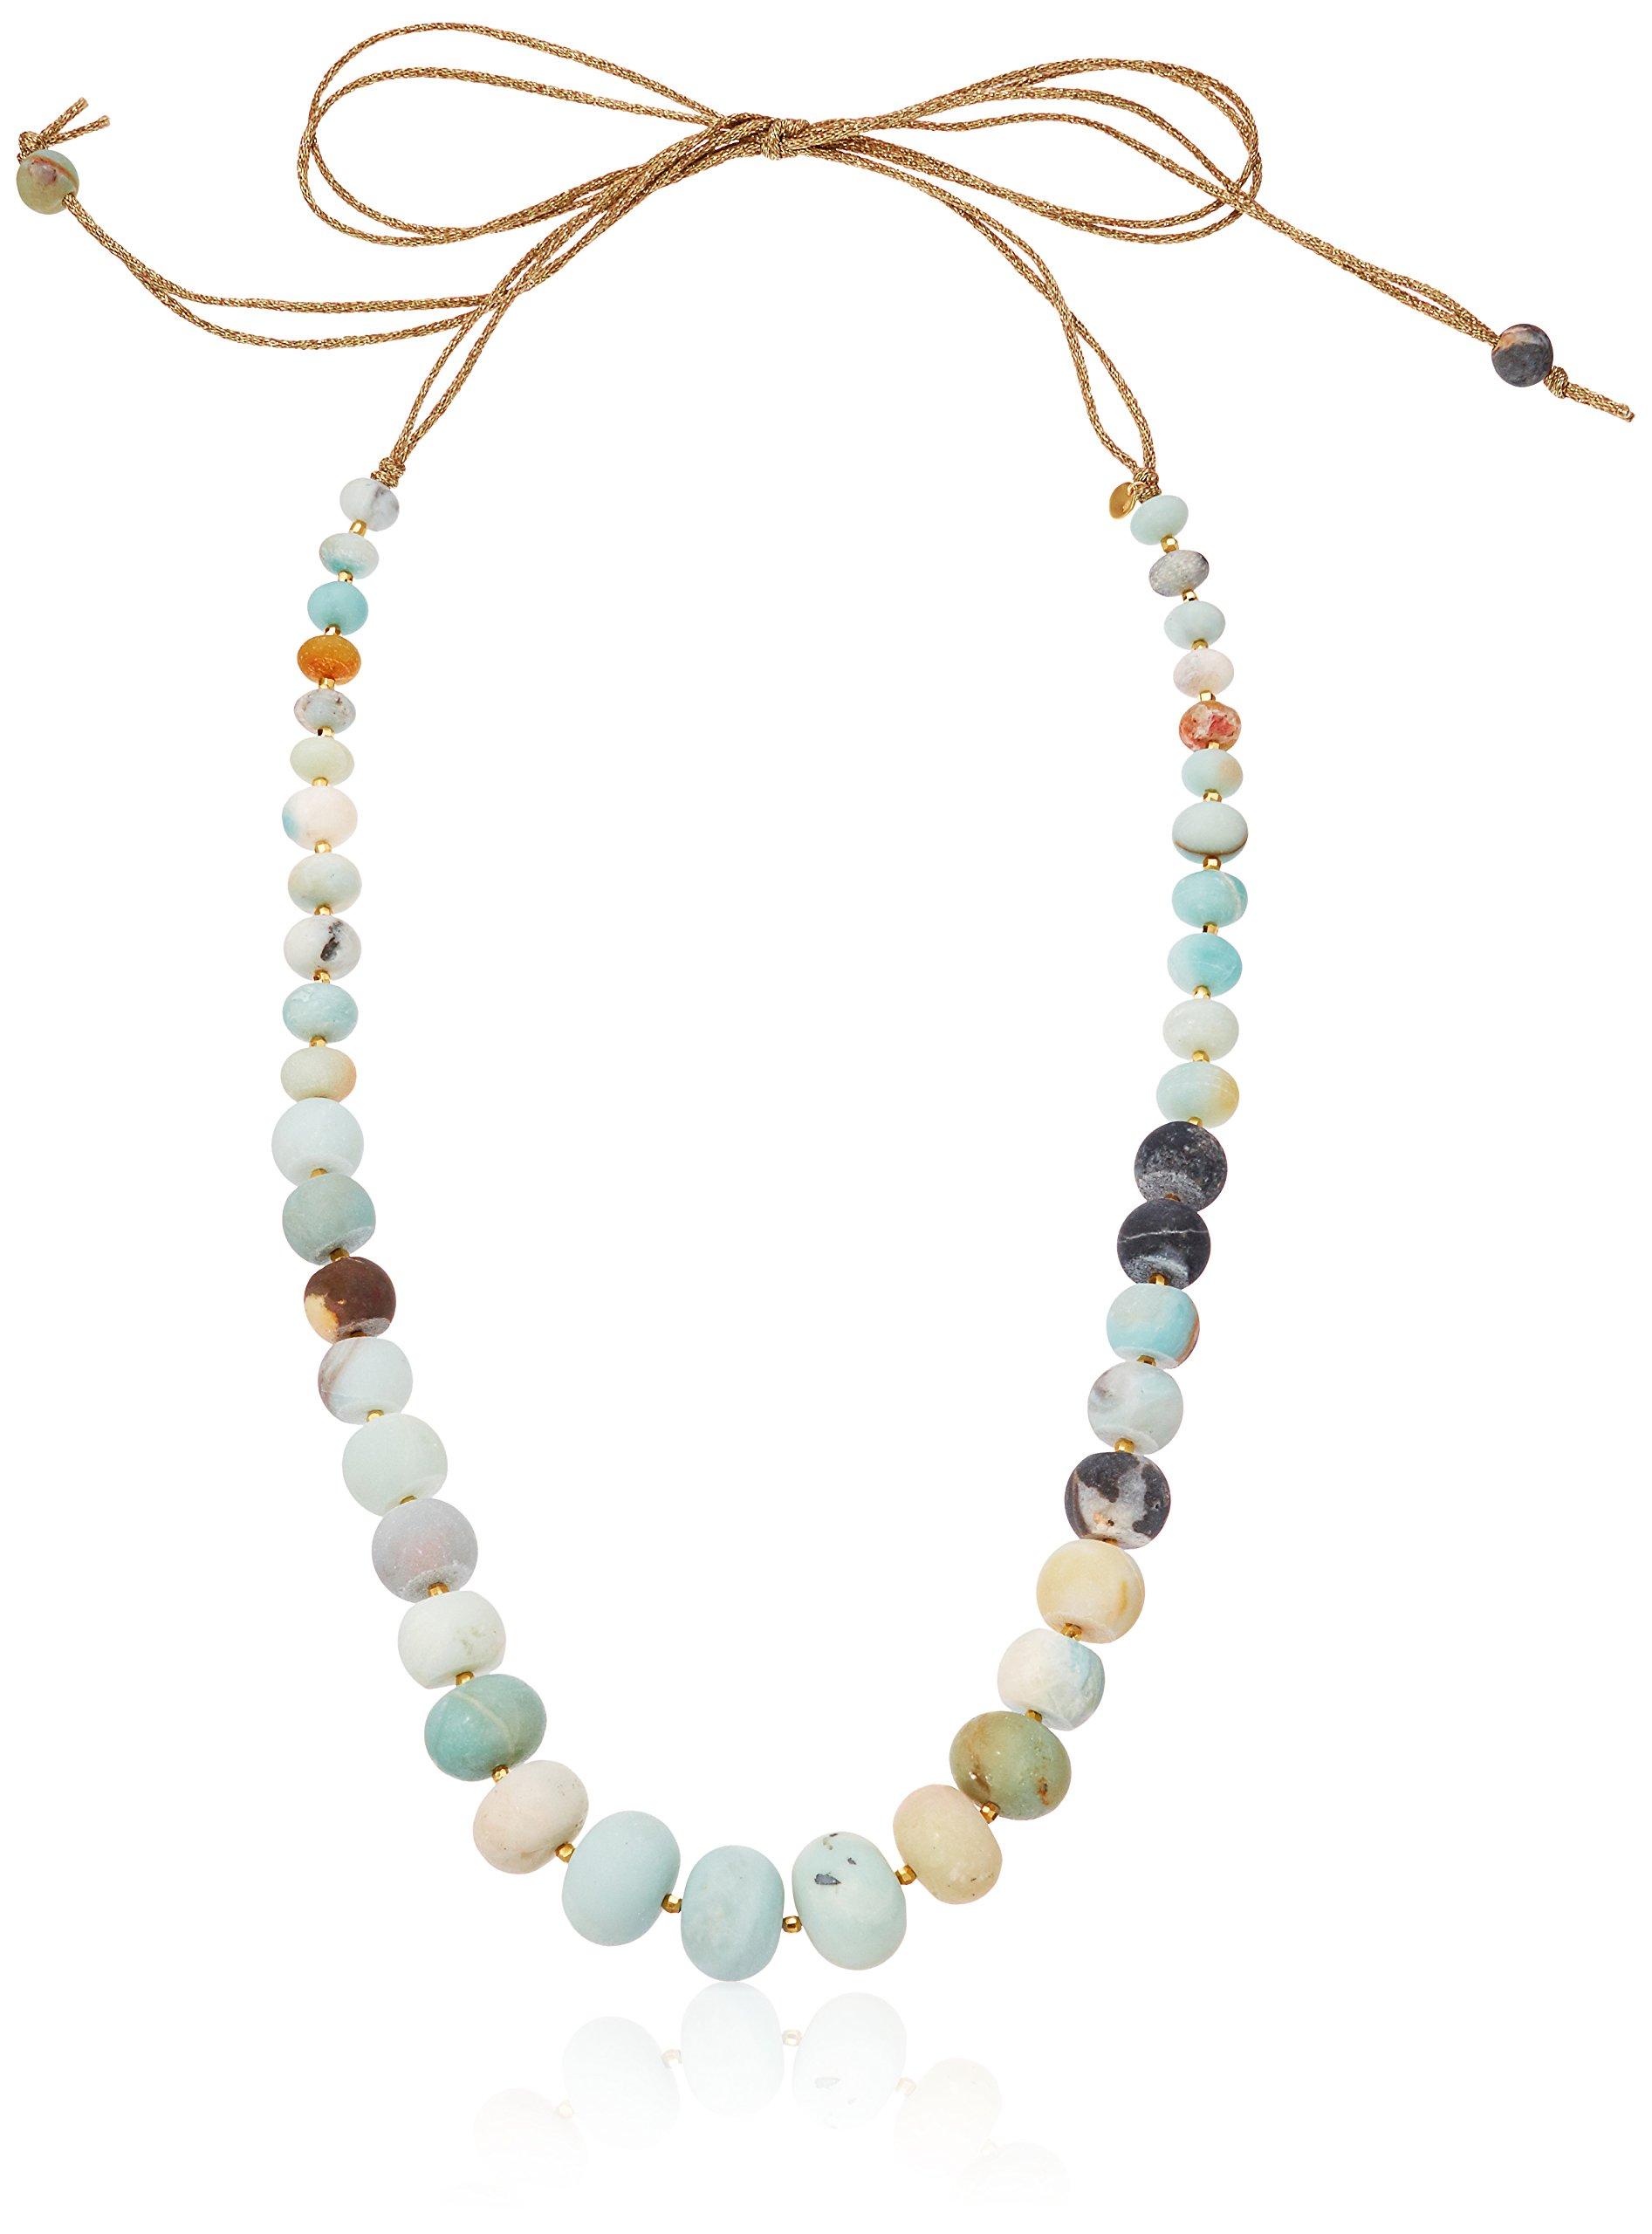 Chan Luu Self Tie Stone Strand Necklace, 58''